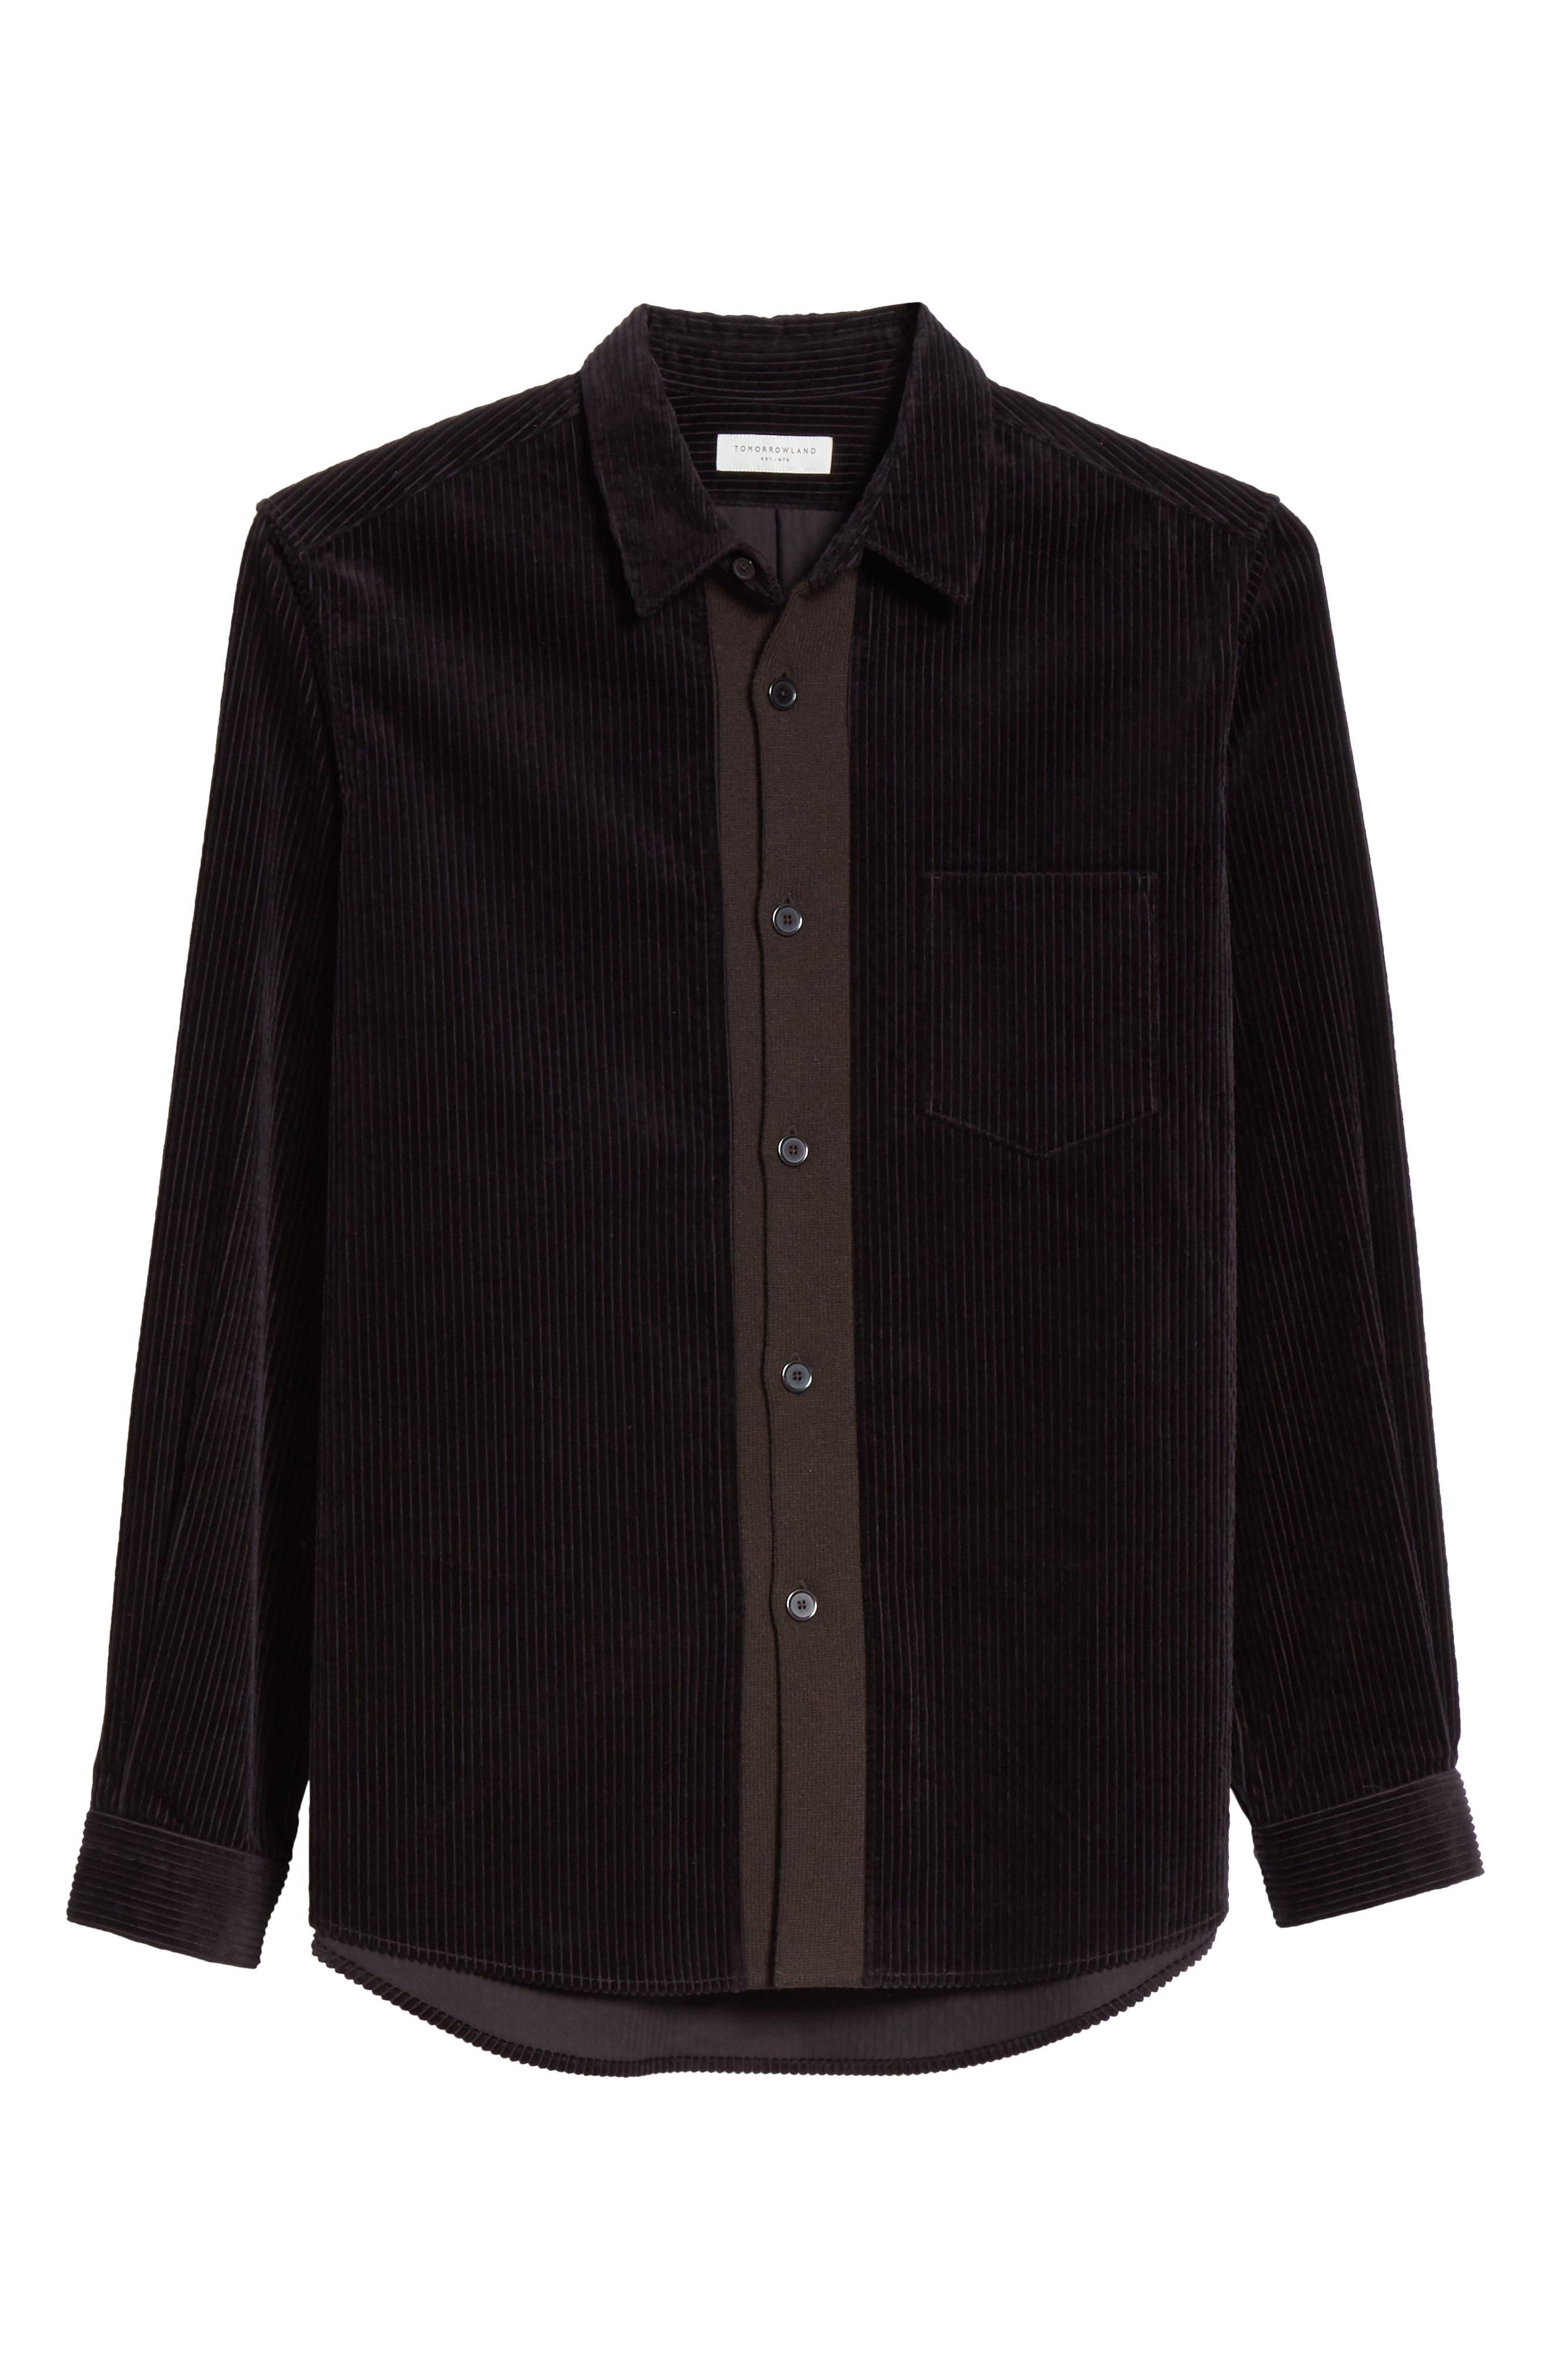 TOMORROWLAND,                             Corduroy Shirt,                             Alternate thumbnail 6, color,                             001